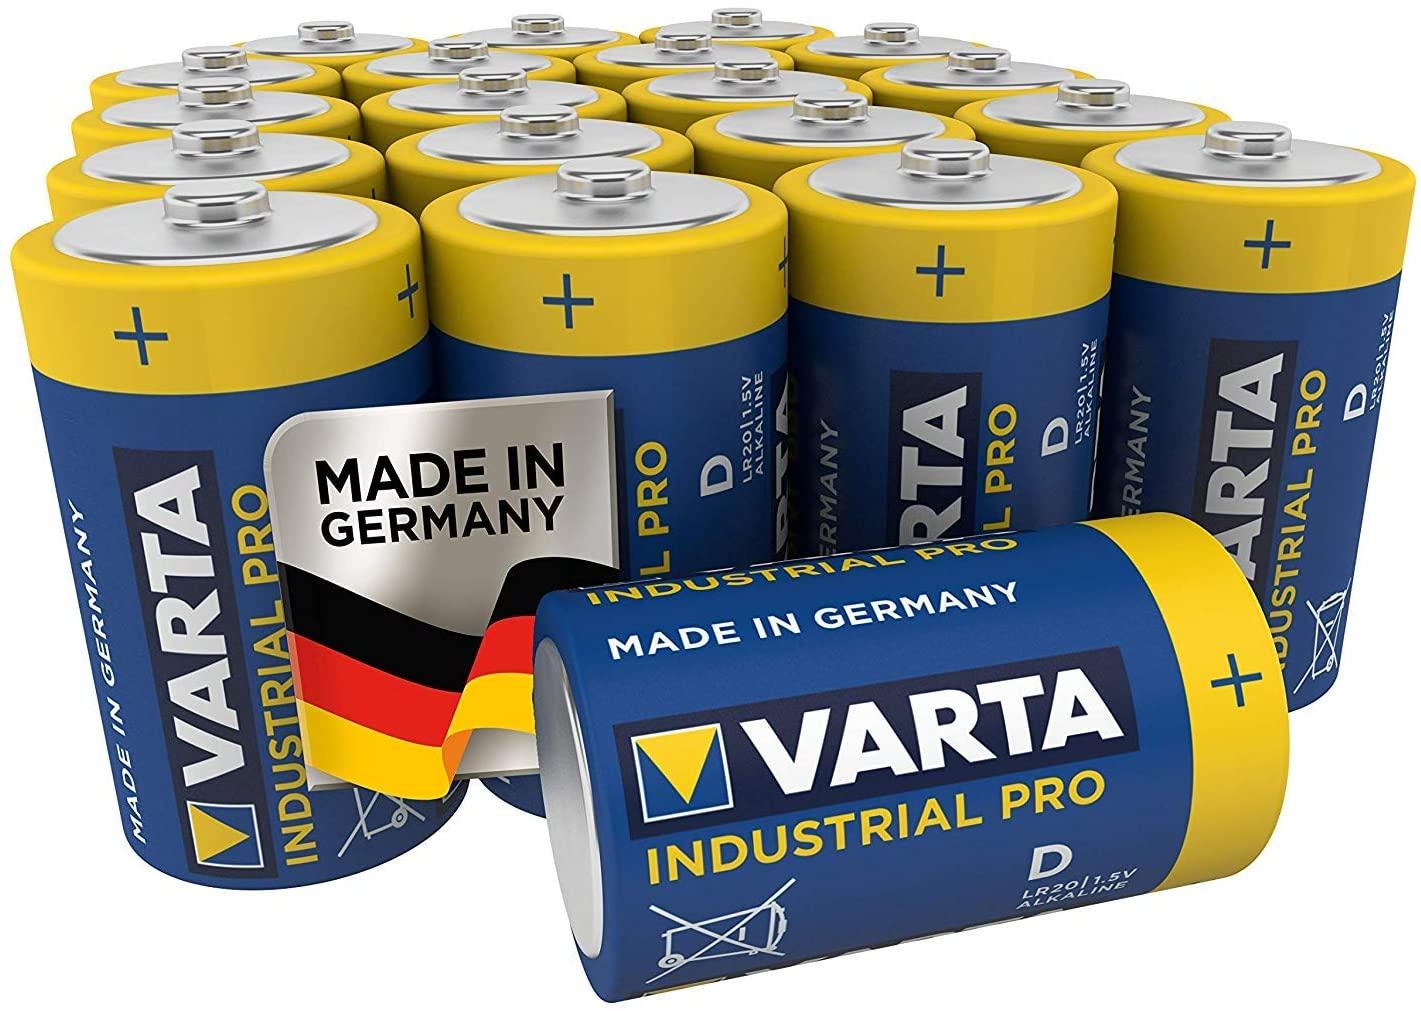 Varta LR20 batteries pack of 20